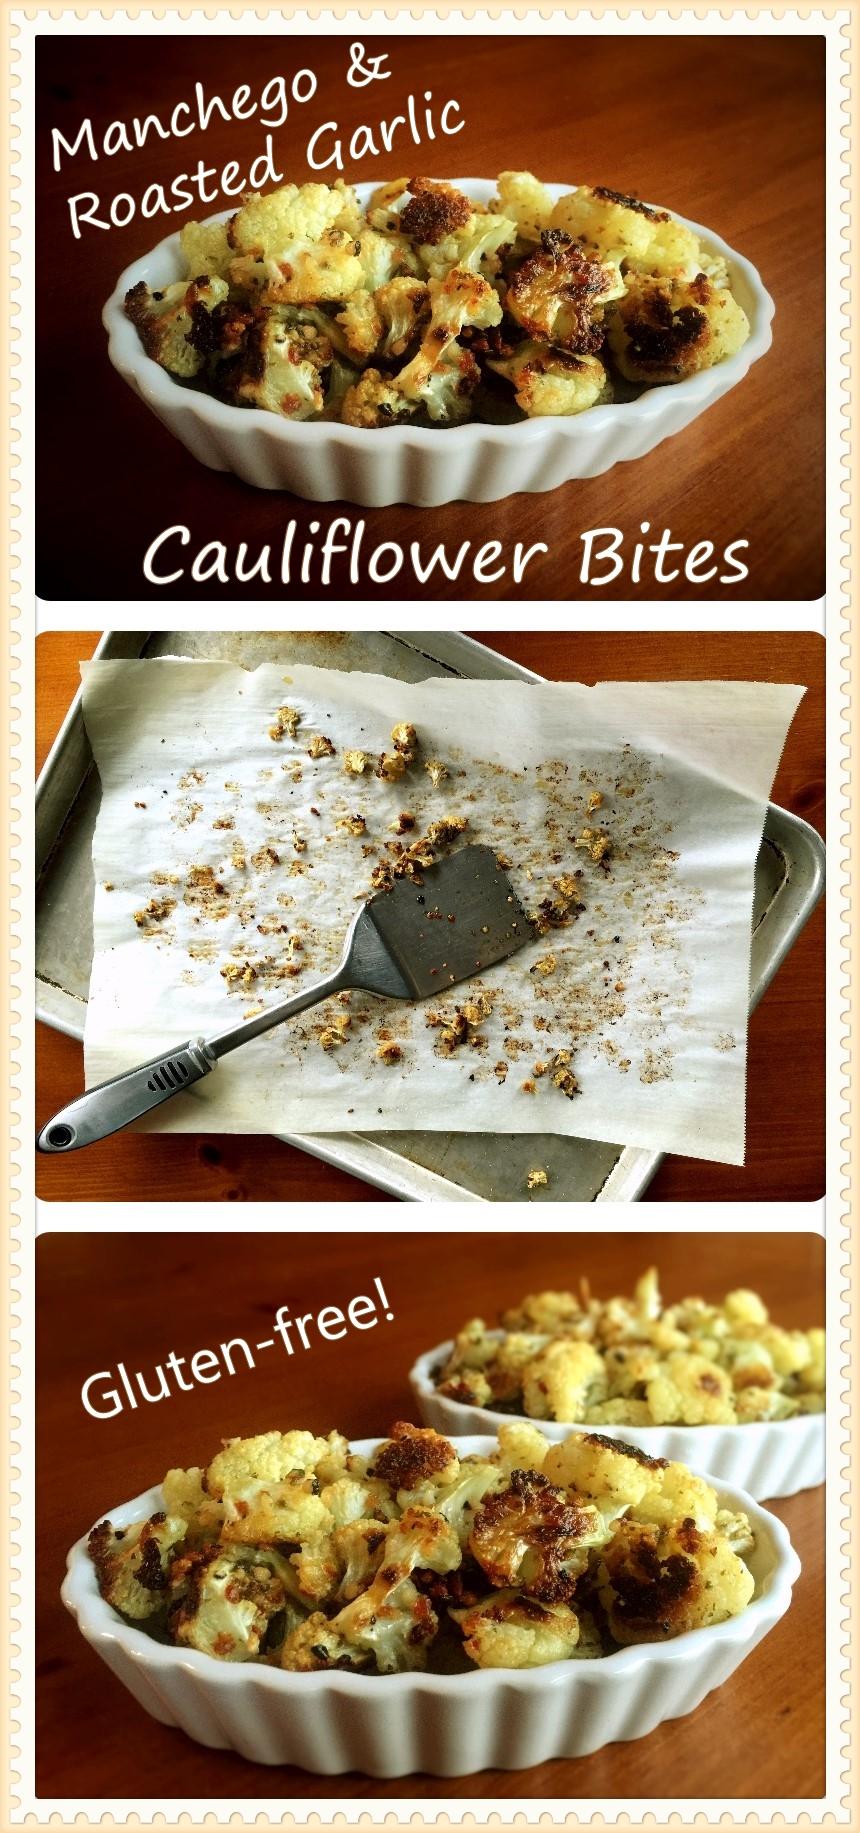 Manchego & Roasted Garlic Cauliflower